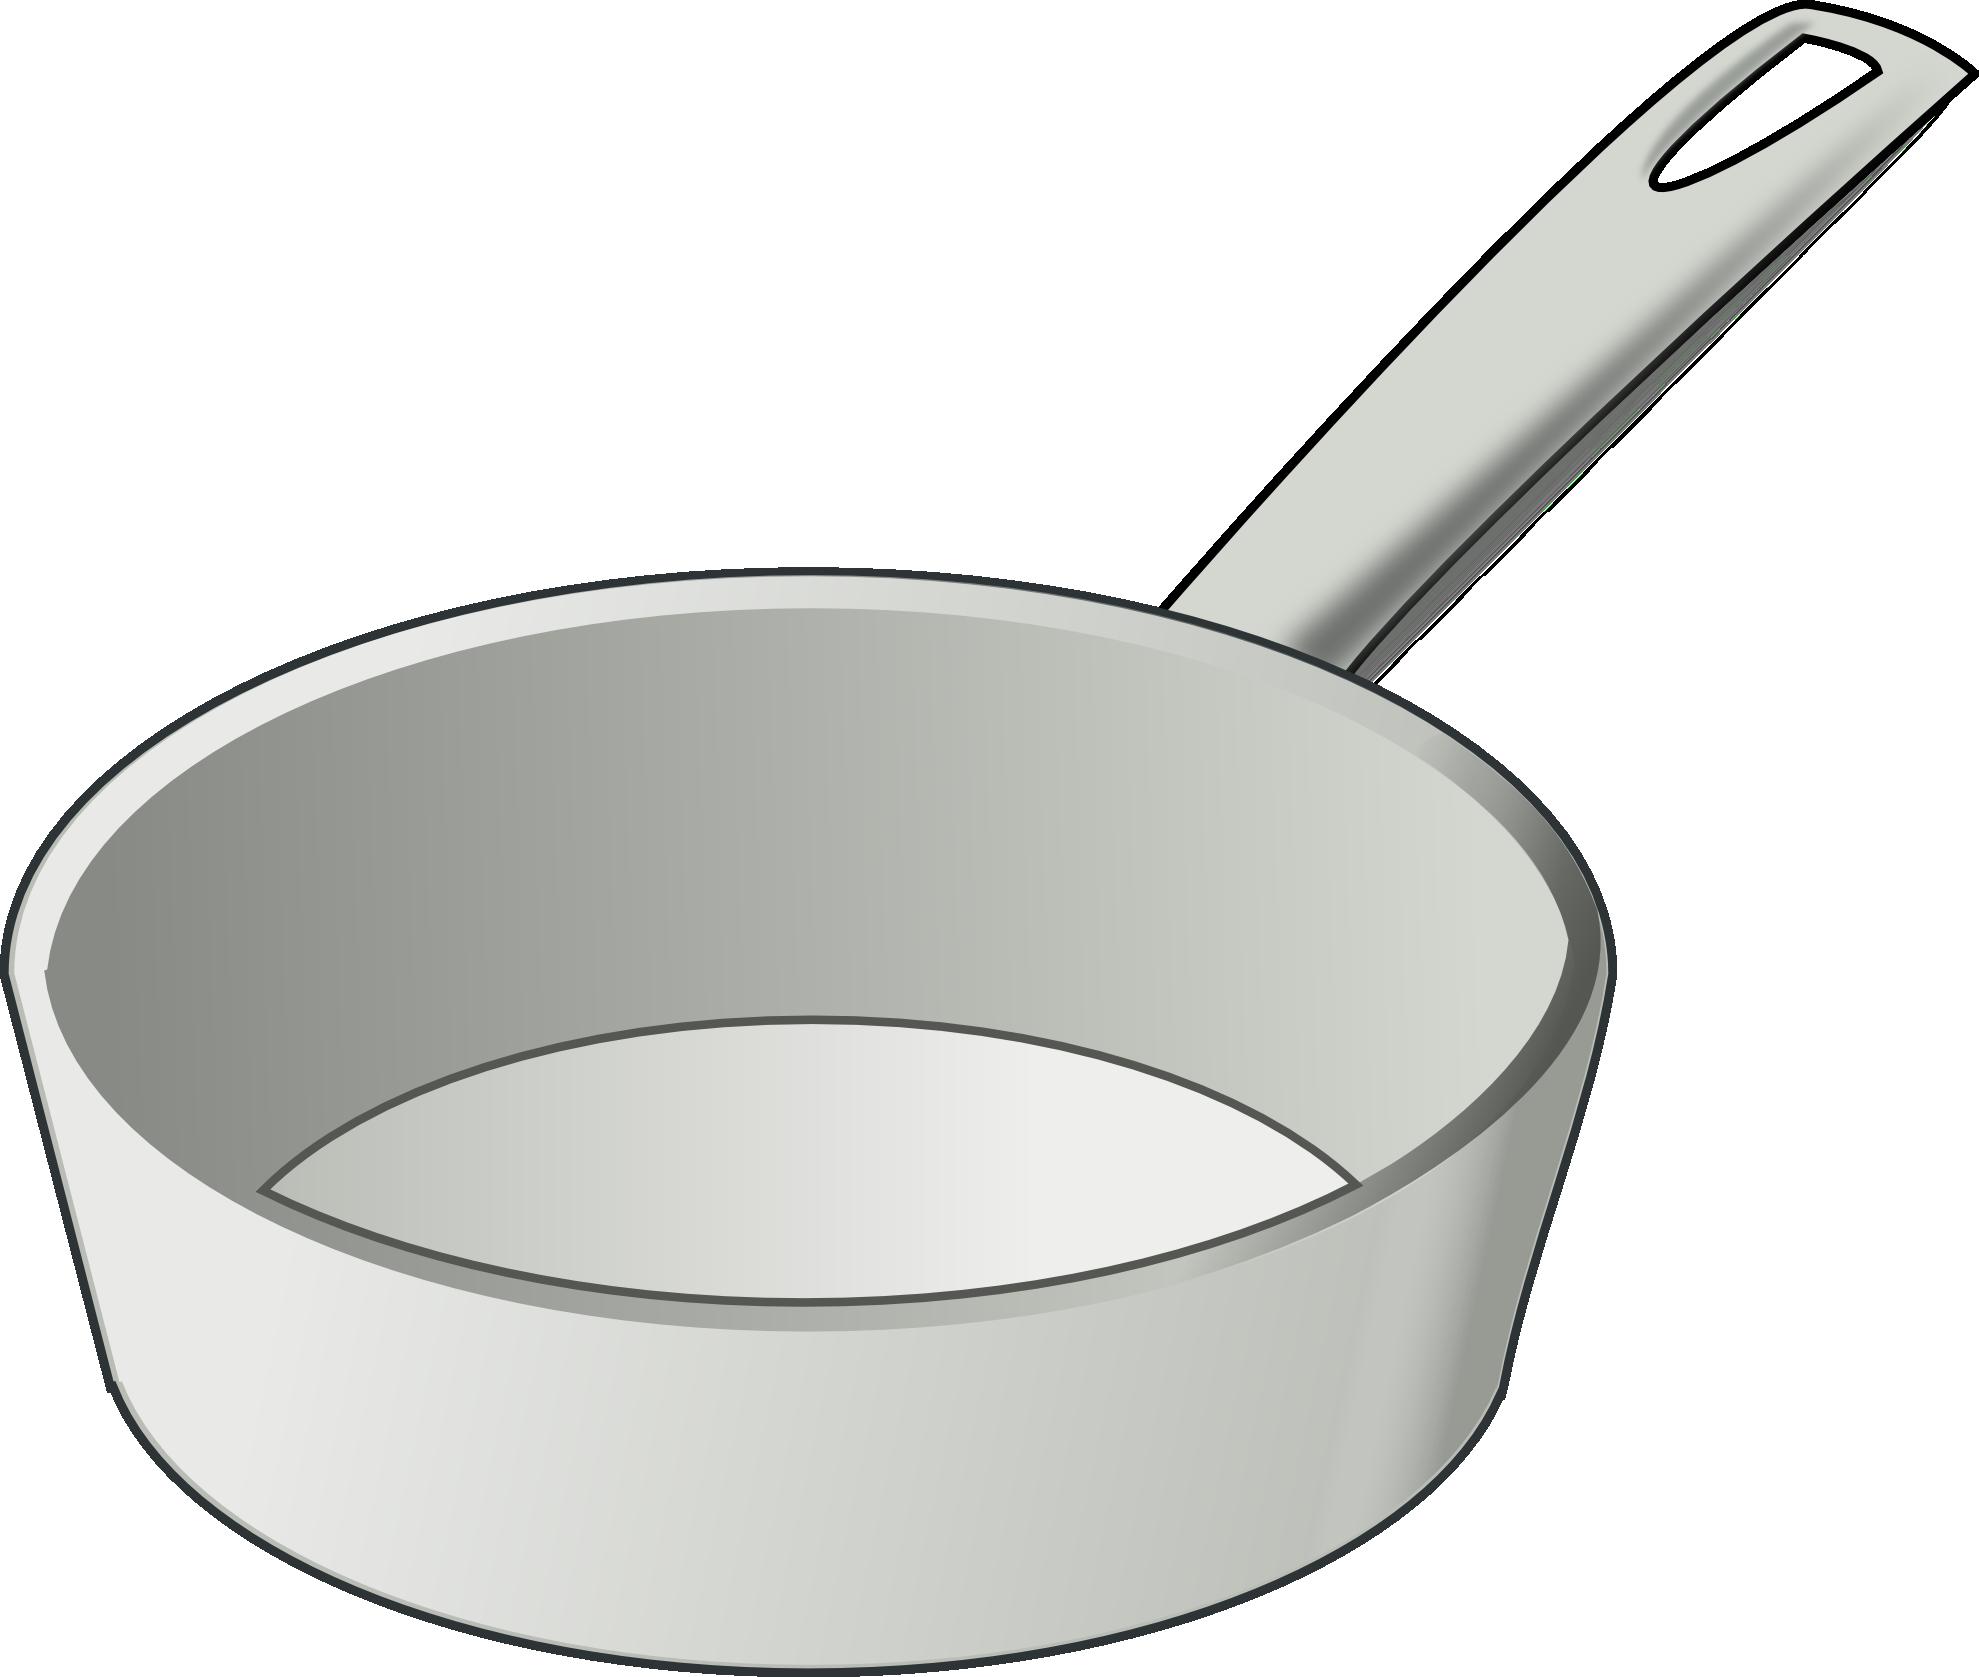 vector royalty free stock Pans group skillet panda. Brush clipart pan